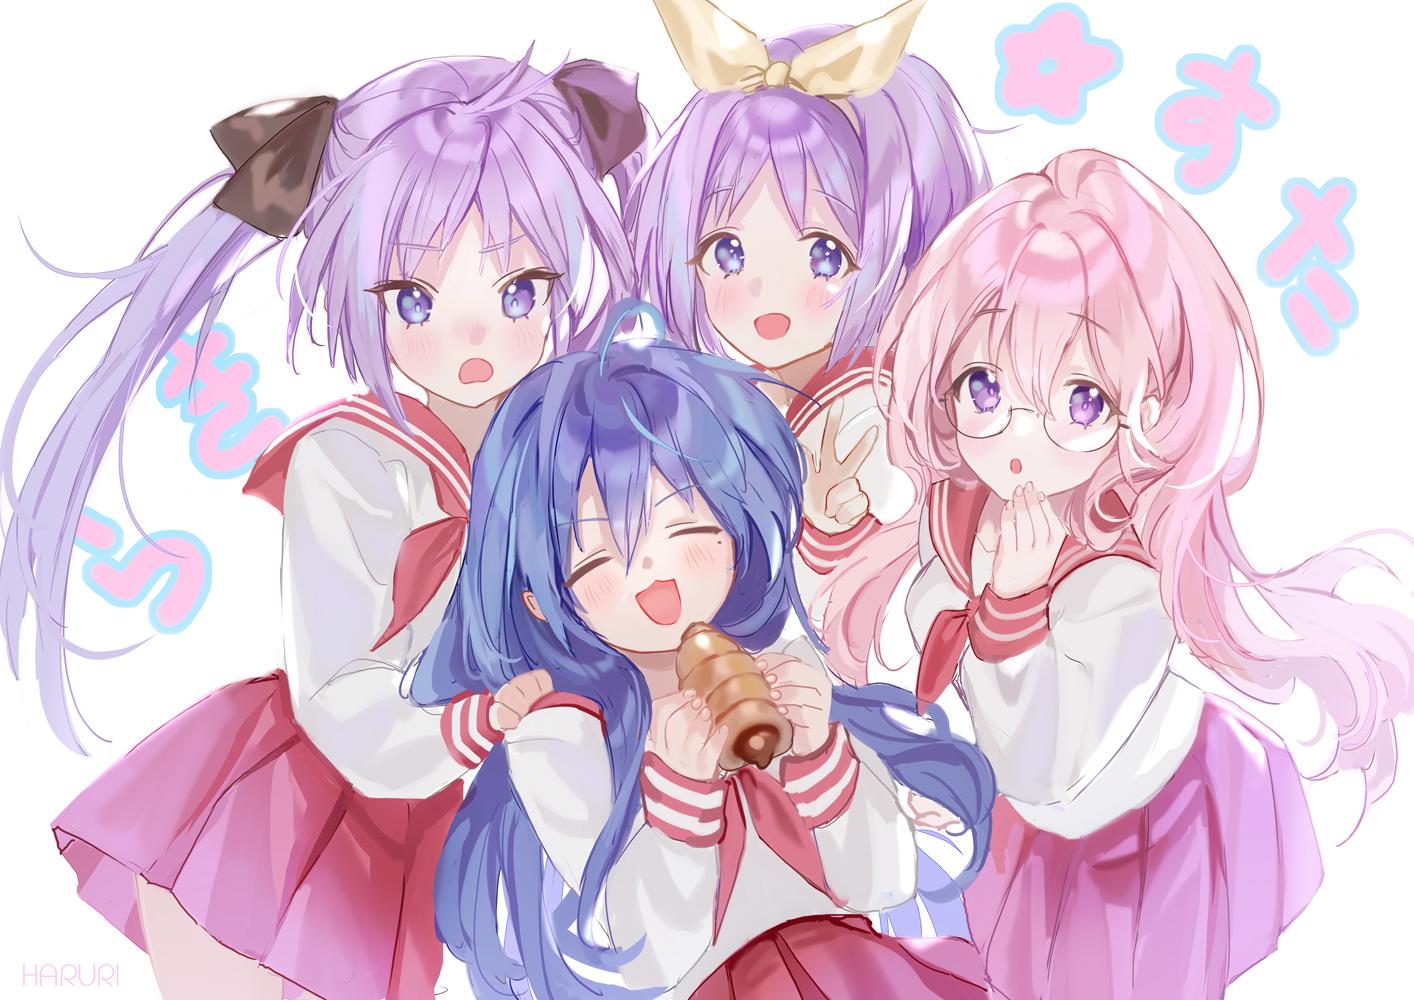 blue_hair blush cat_smile food glasses group hiiragi_kagami hiiragi_tsukasa izumi_konata long_hair lucky_star mullpull pink_hair purple_eyes purple_hair school_uniform short_hair skirt takara_miyuki twins twintails watermark